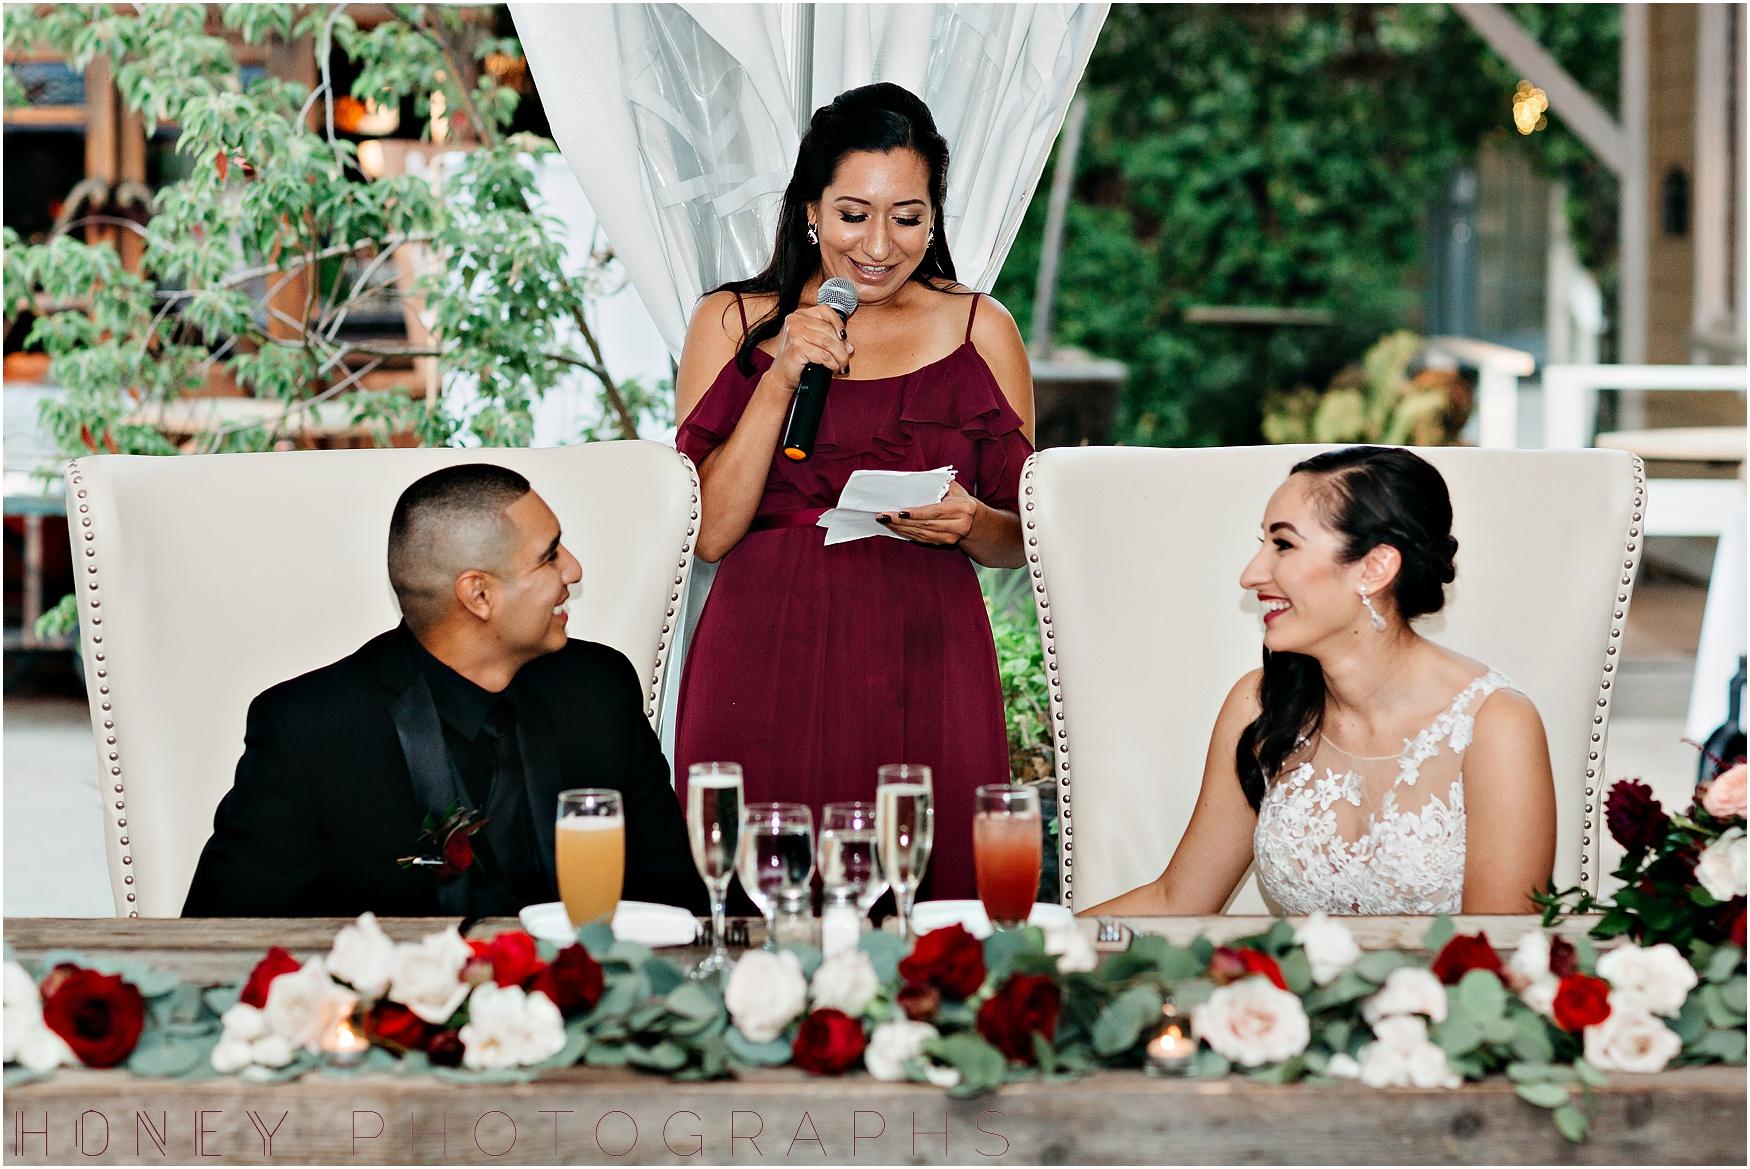 twin_oaks_garden_estate_fall_winter_burgundy_wedding058.jpg